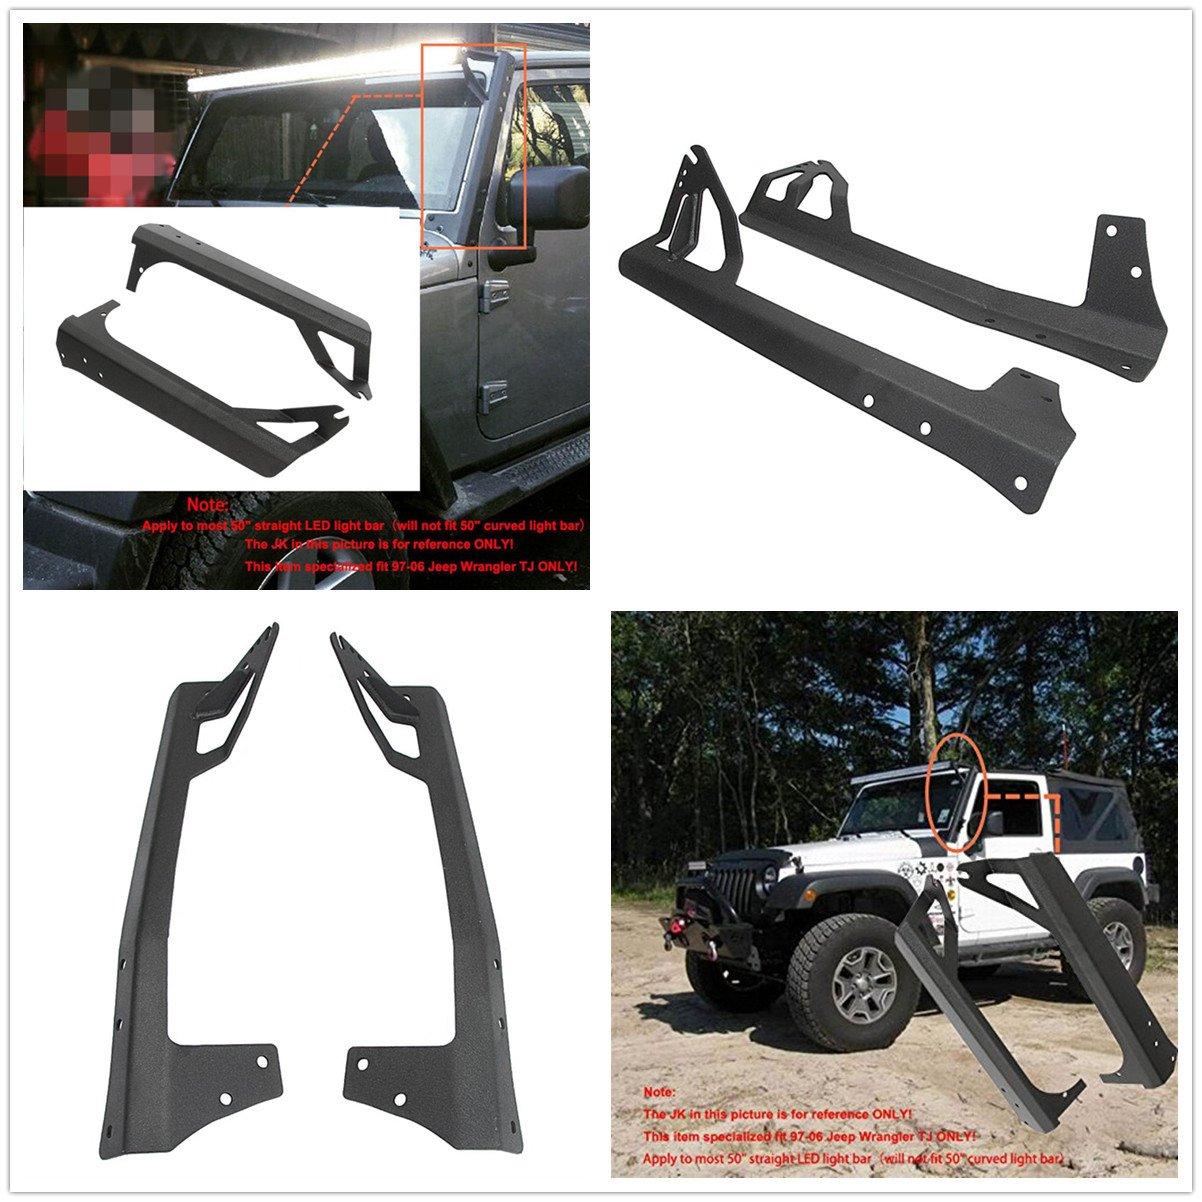 Fit Jeep Wrangler Jk 2007 2017 Offroad Light Bar Kit Powlab 52 Inch Wiring Harness 6000k